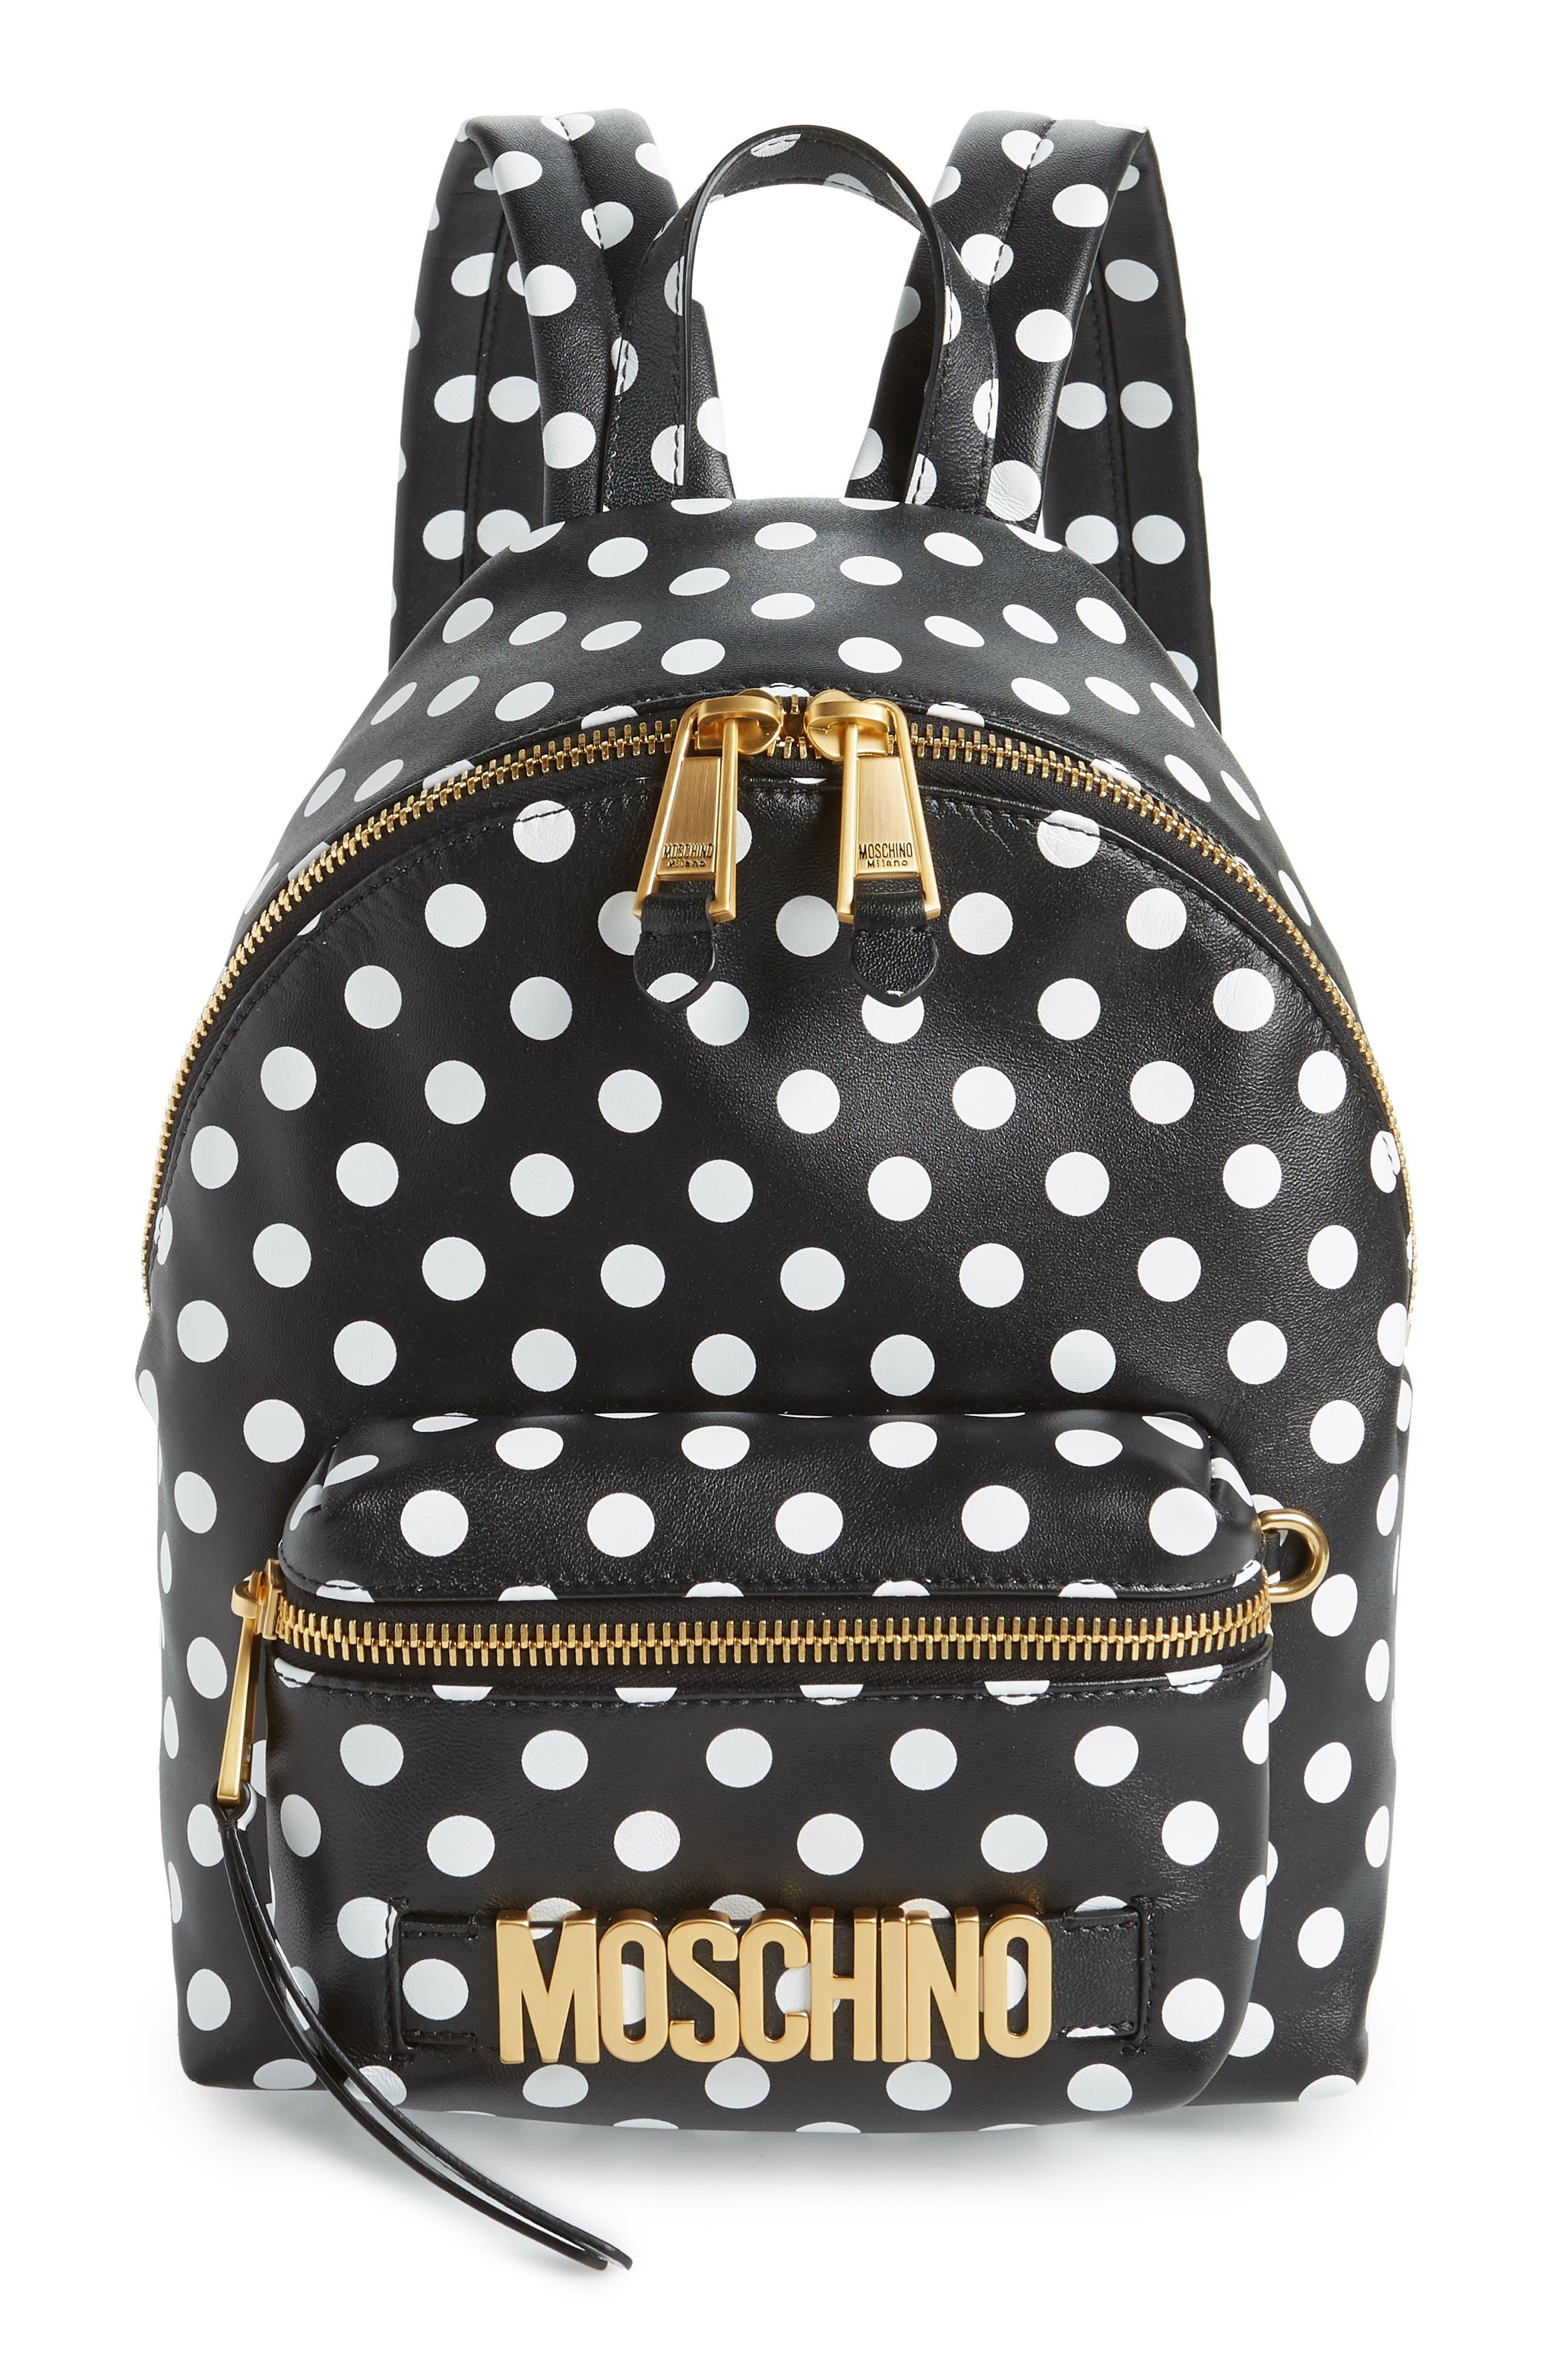 MOSCHINO, Logo Polka Dot Backpack, Main thumbnail 1, color, BLACK/ WHITE